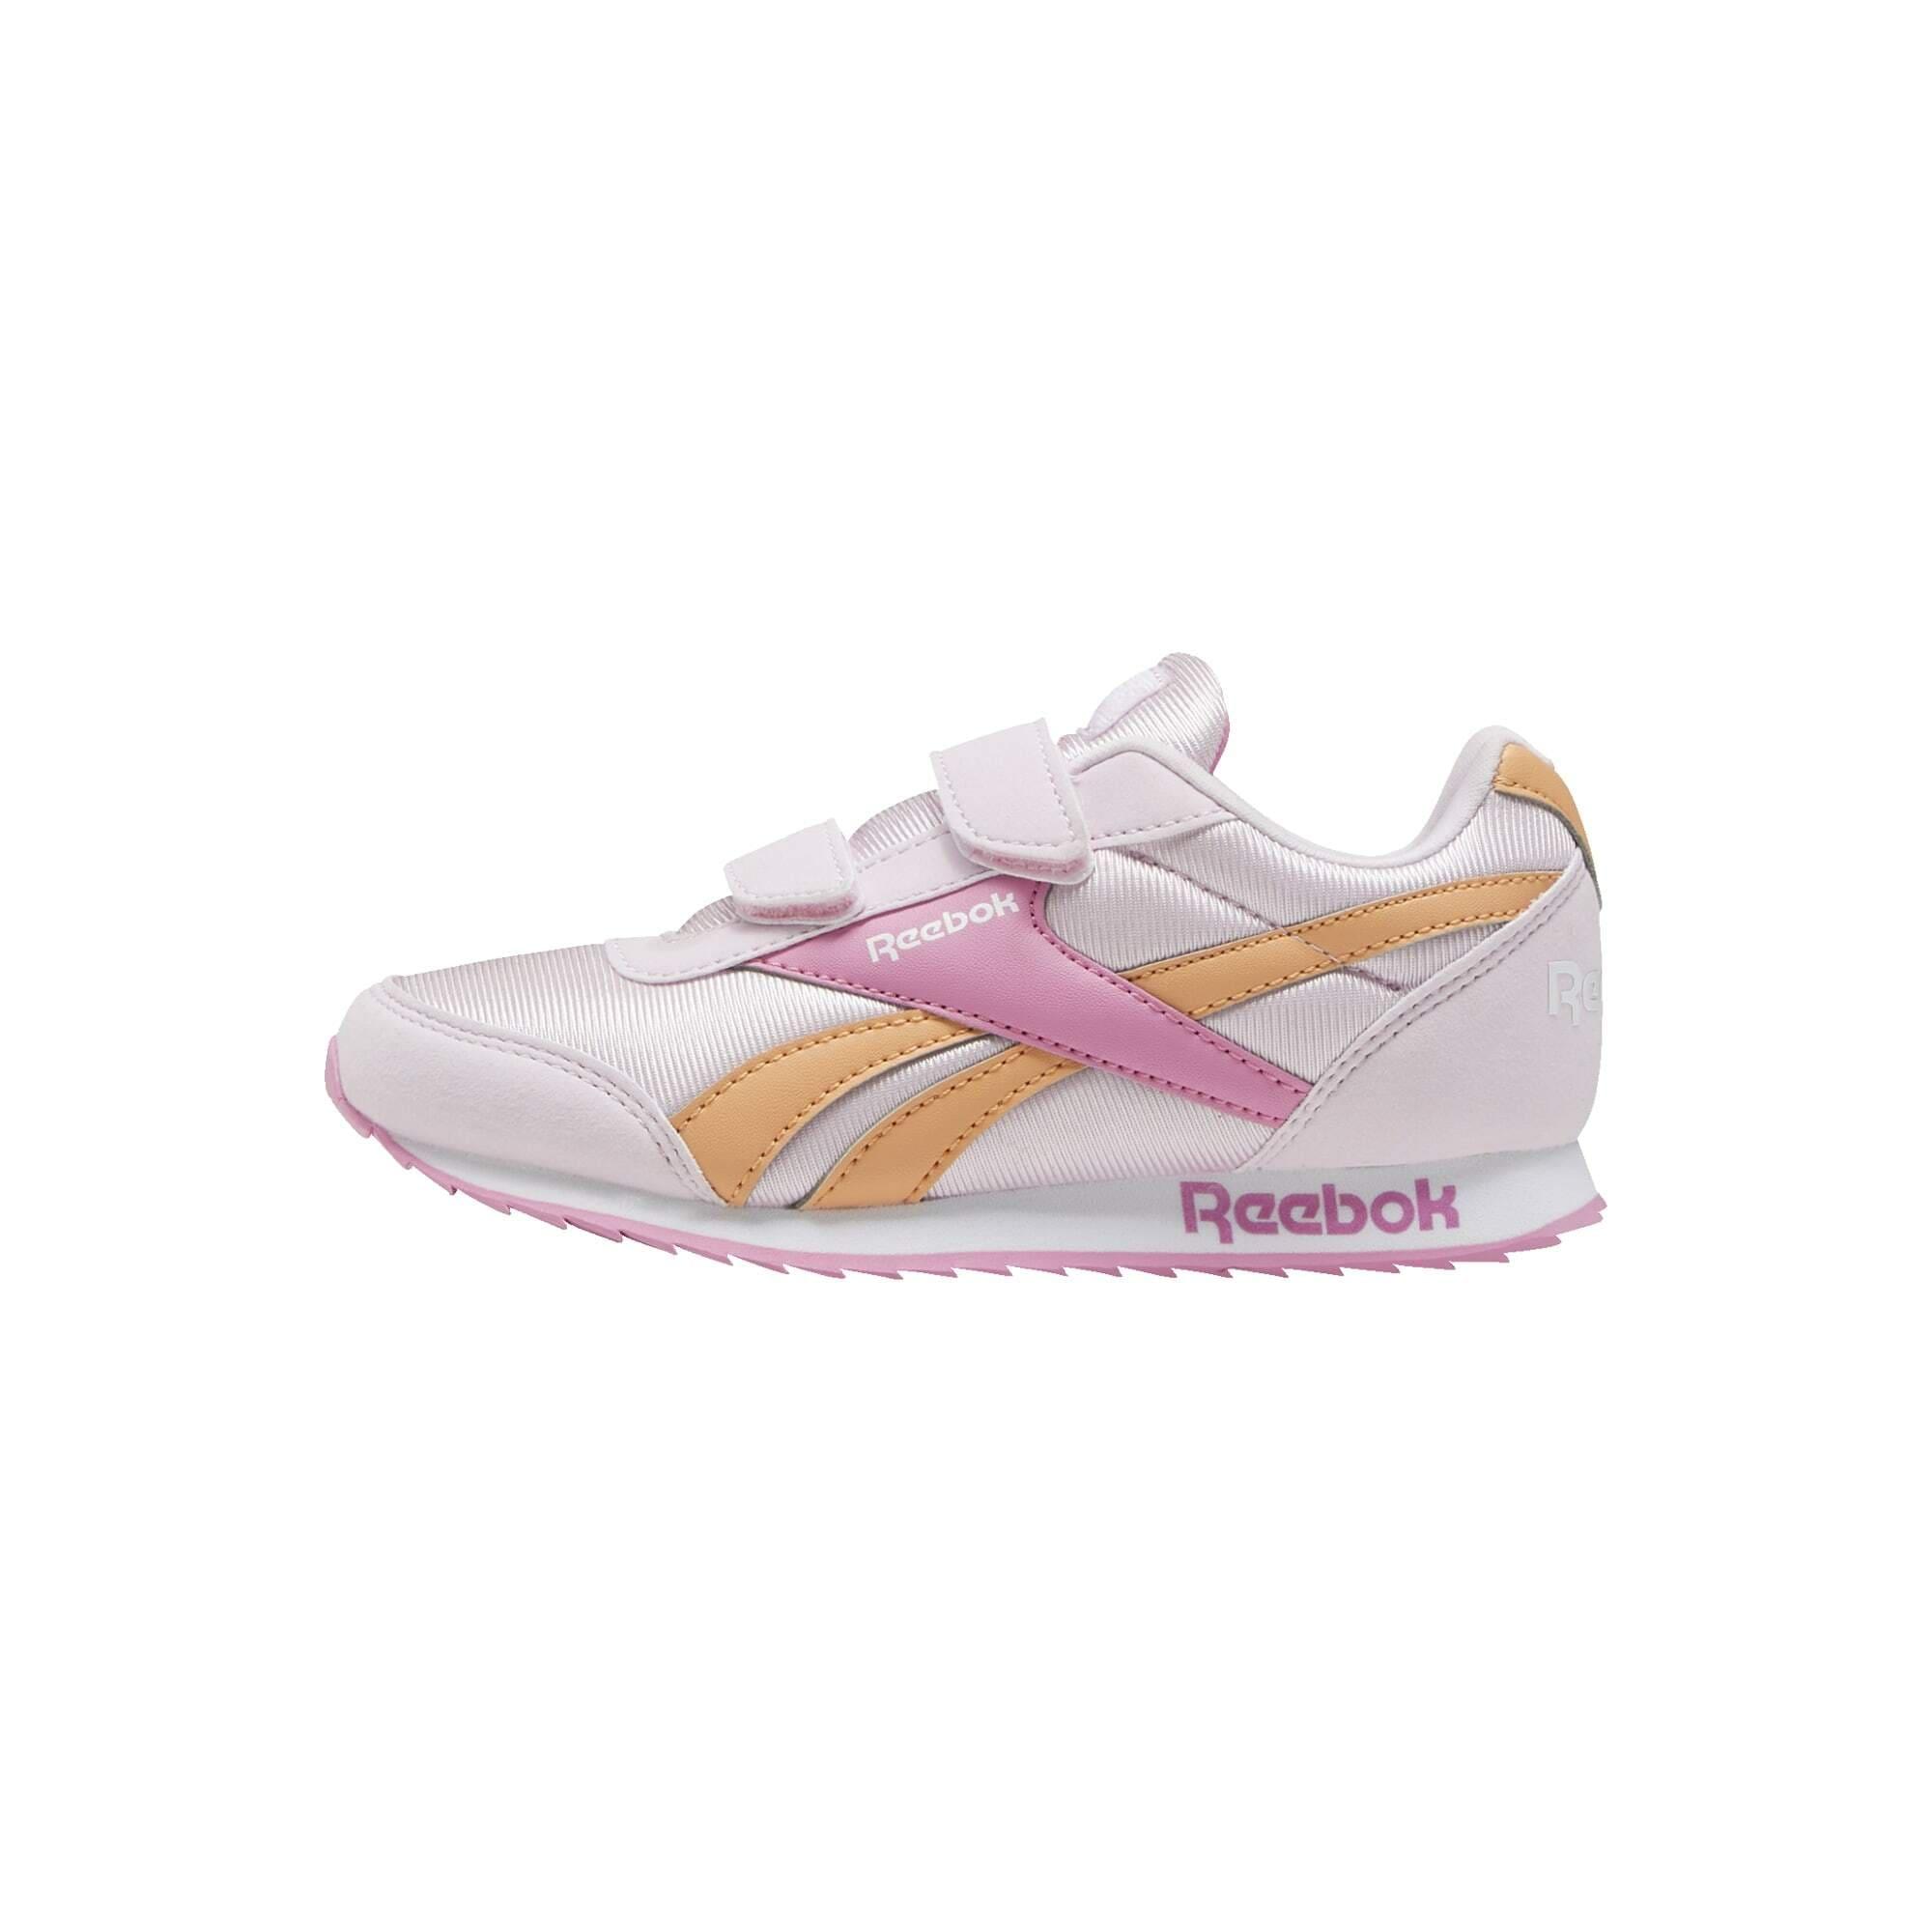 Reebok Classic Tenisky  pastelovo ružová / svetloružová / oranžová